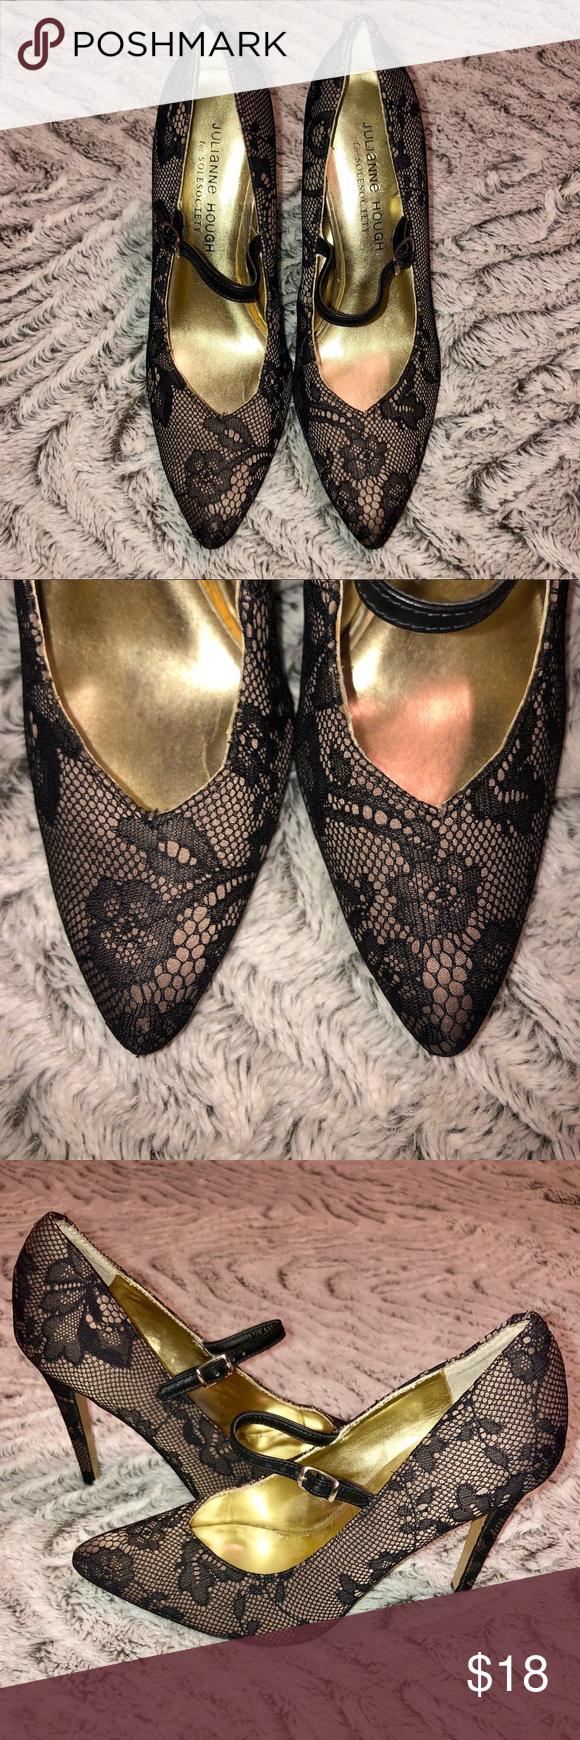 MAKE OFFER! Julianne Hough for Solesociety Heels Super cute laced Julianne Hough heels! Sole Society Shoes Heels #juliannehoughstyle MAKE OFFER! Julianne Hough for Solesociety Heels Super cute laced Julianne Hough heels! Sole Society Shoes Heels #juliannehoughstyle